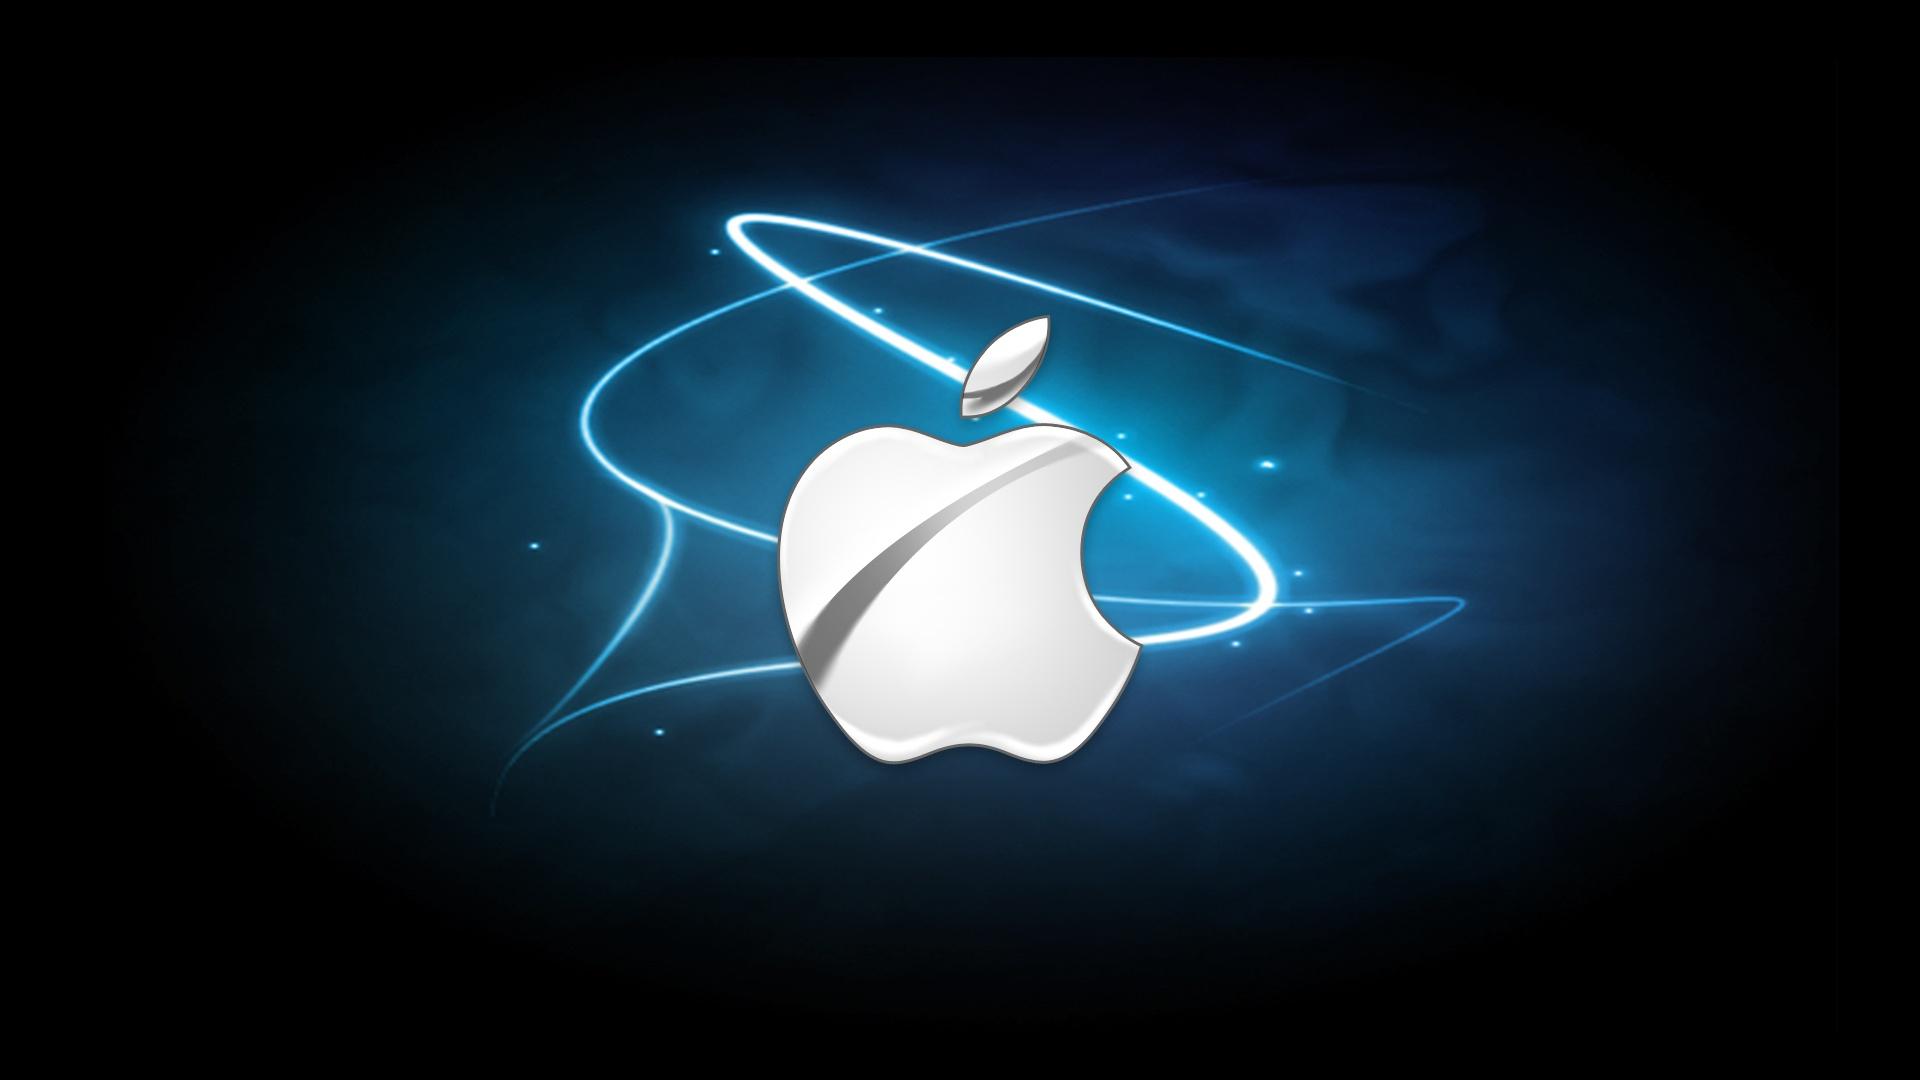 Amazing-Apple-Logo-Bing-images-wallpaper-wp3402290